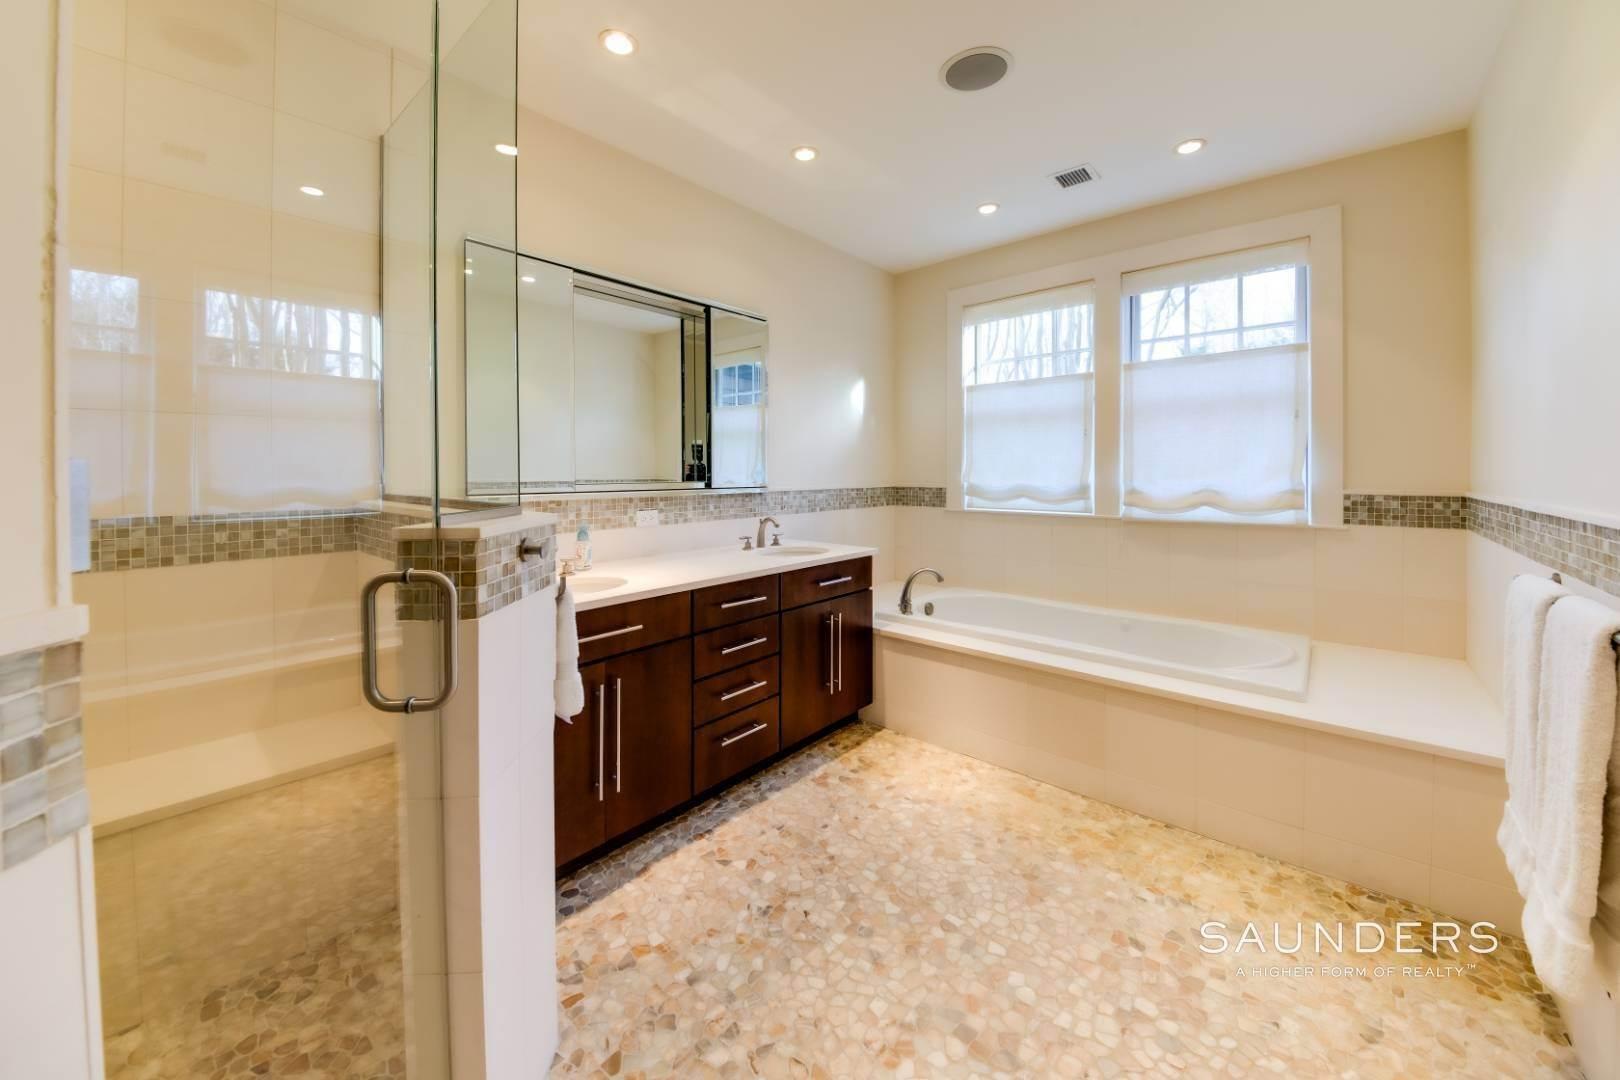 16. Single Family Homes for Sale at Wainscott South Traditional Near Beach Lane 10 Merriwood Drive, Wainscott, East Hampton Town, NY 11975